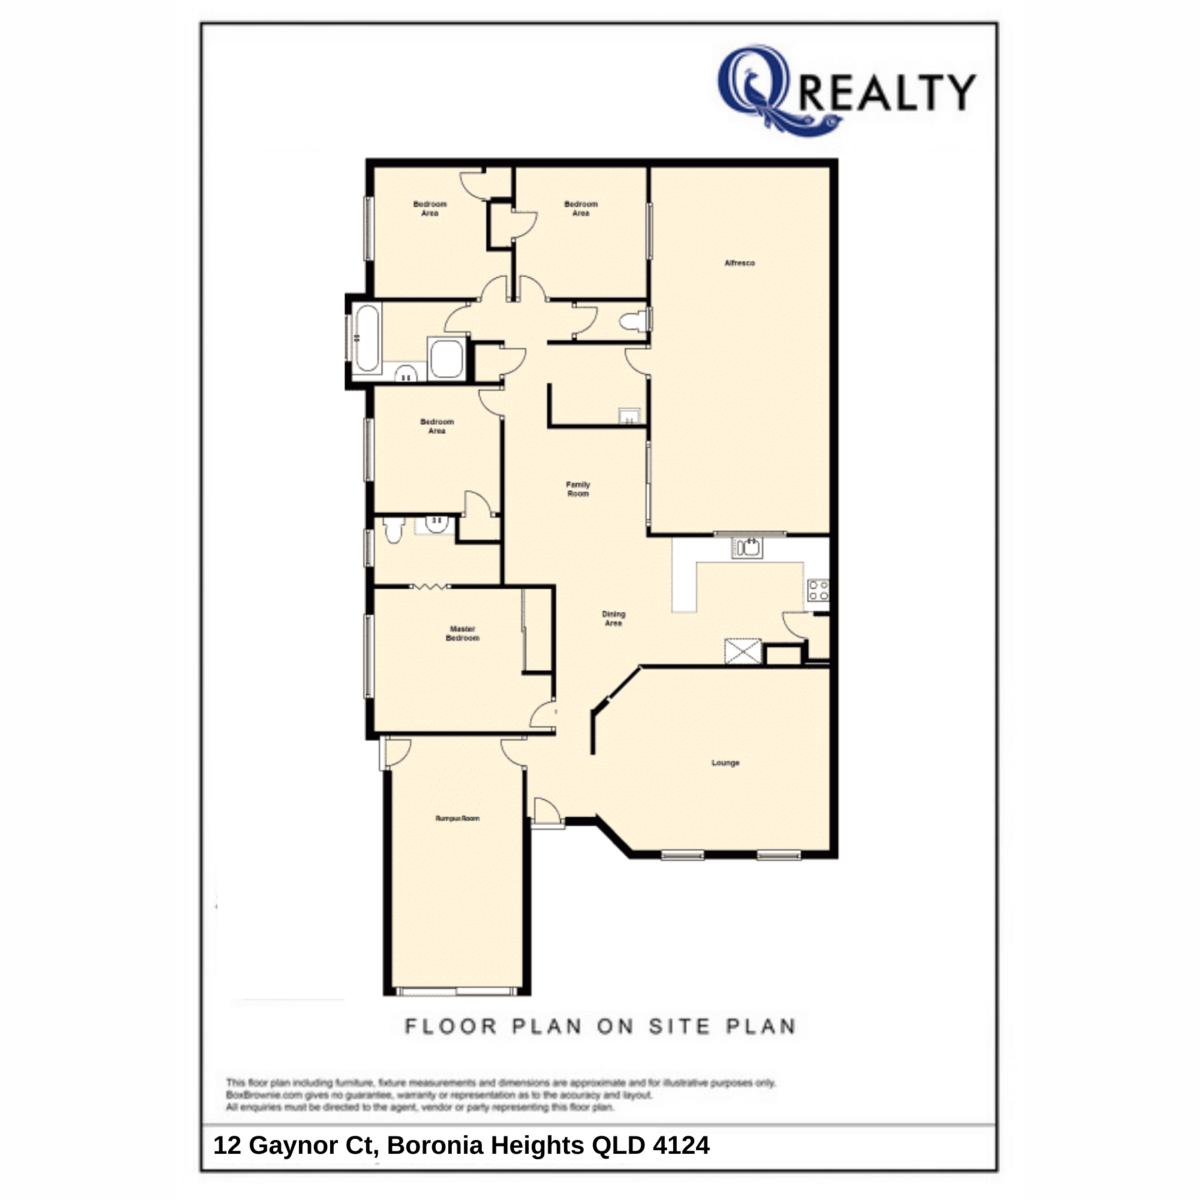 12 Gaynor Court, Boronia Heights  QLD  4124